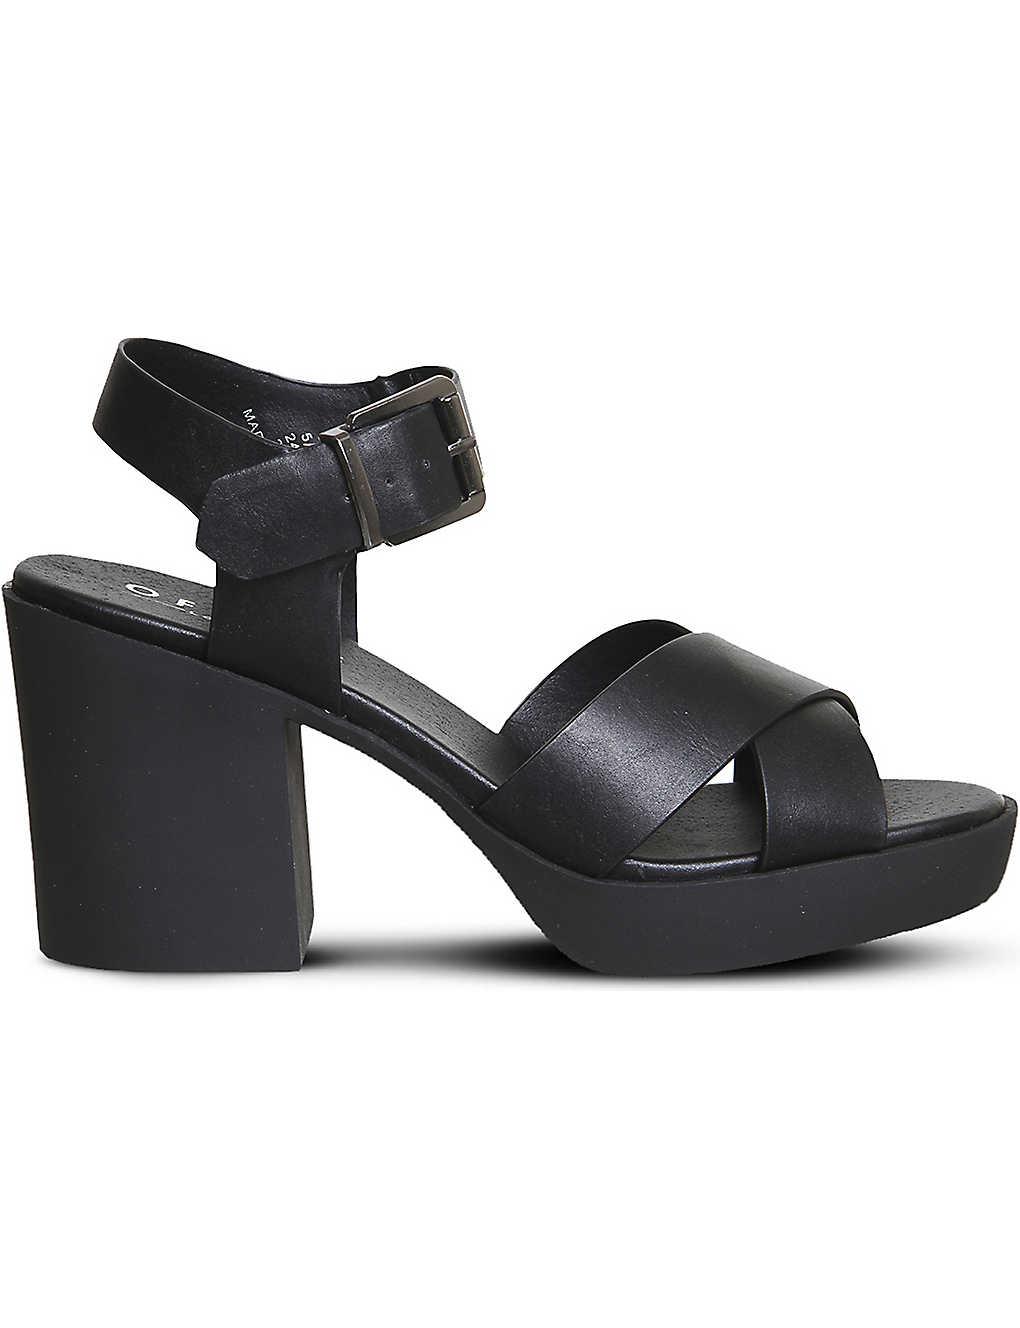 96f431c6e11d OFFICE - Marker chunky cross-strap sandals